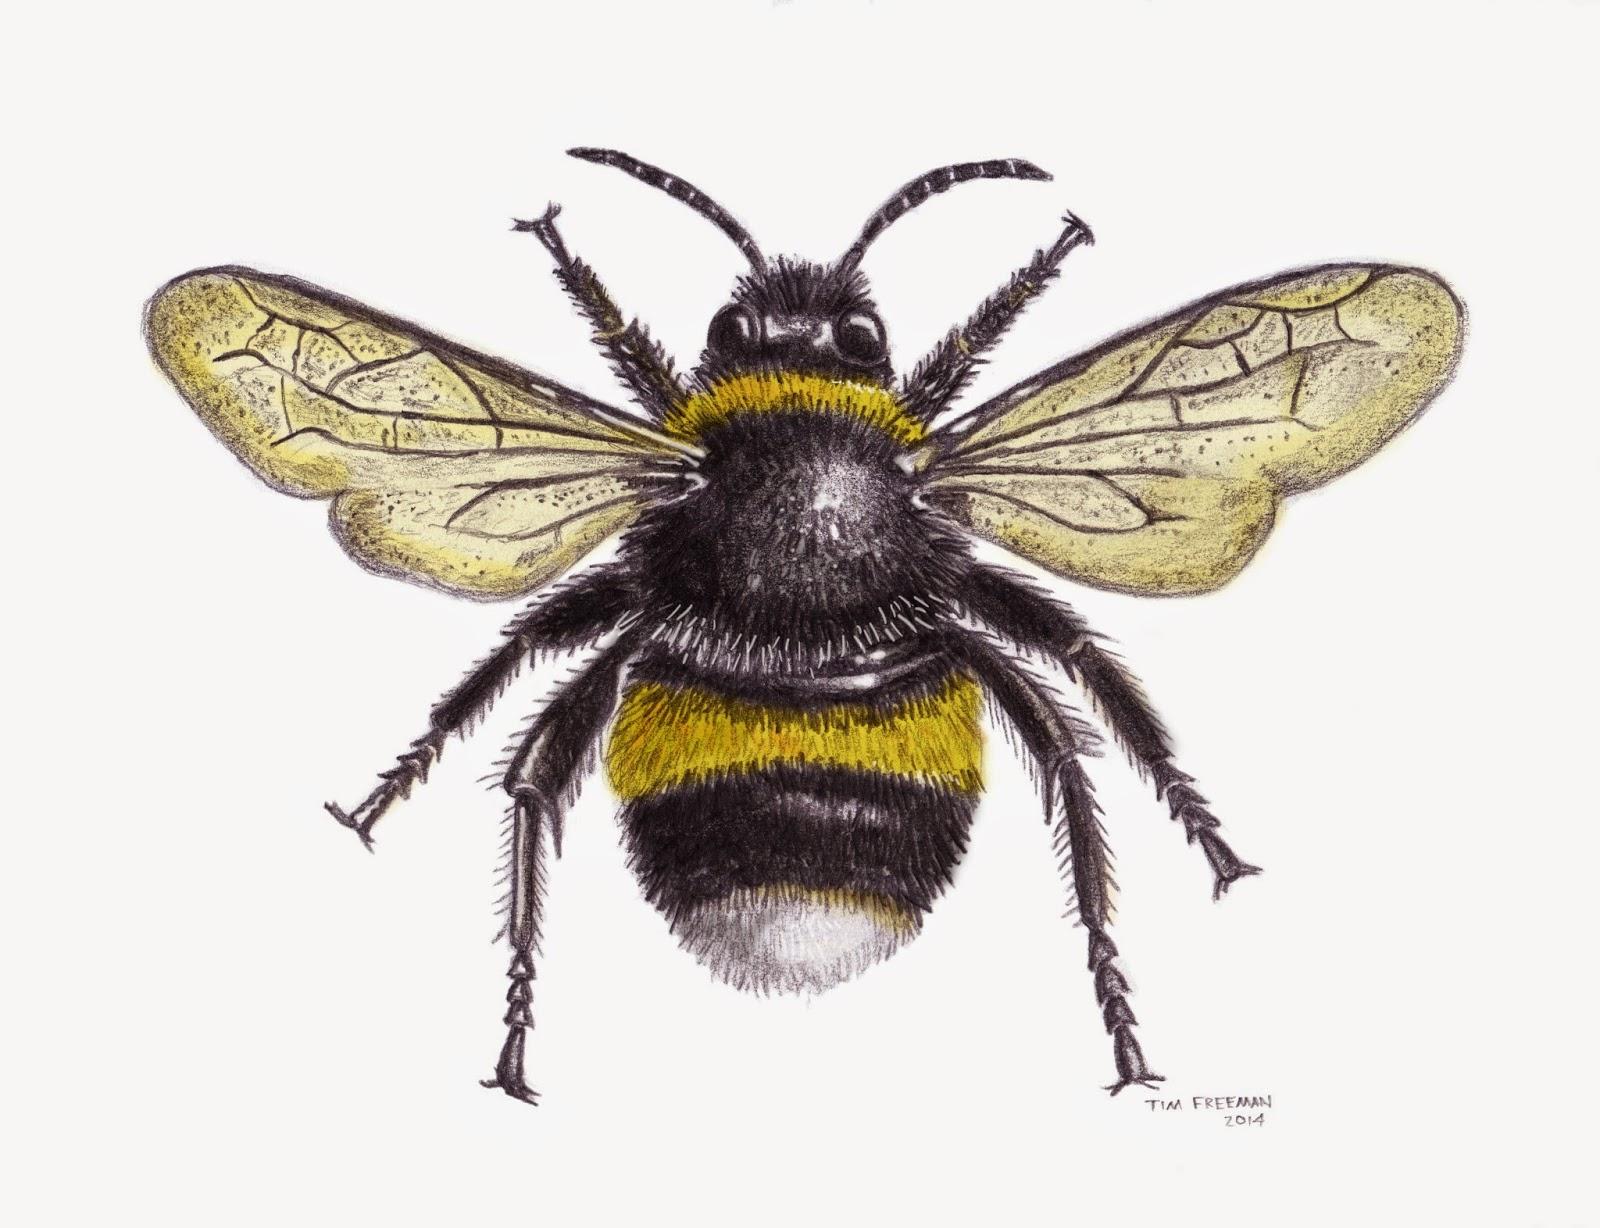 1600x1228 Tim Freeman Design Amp Illustration Bumble Bee Graphics